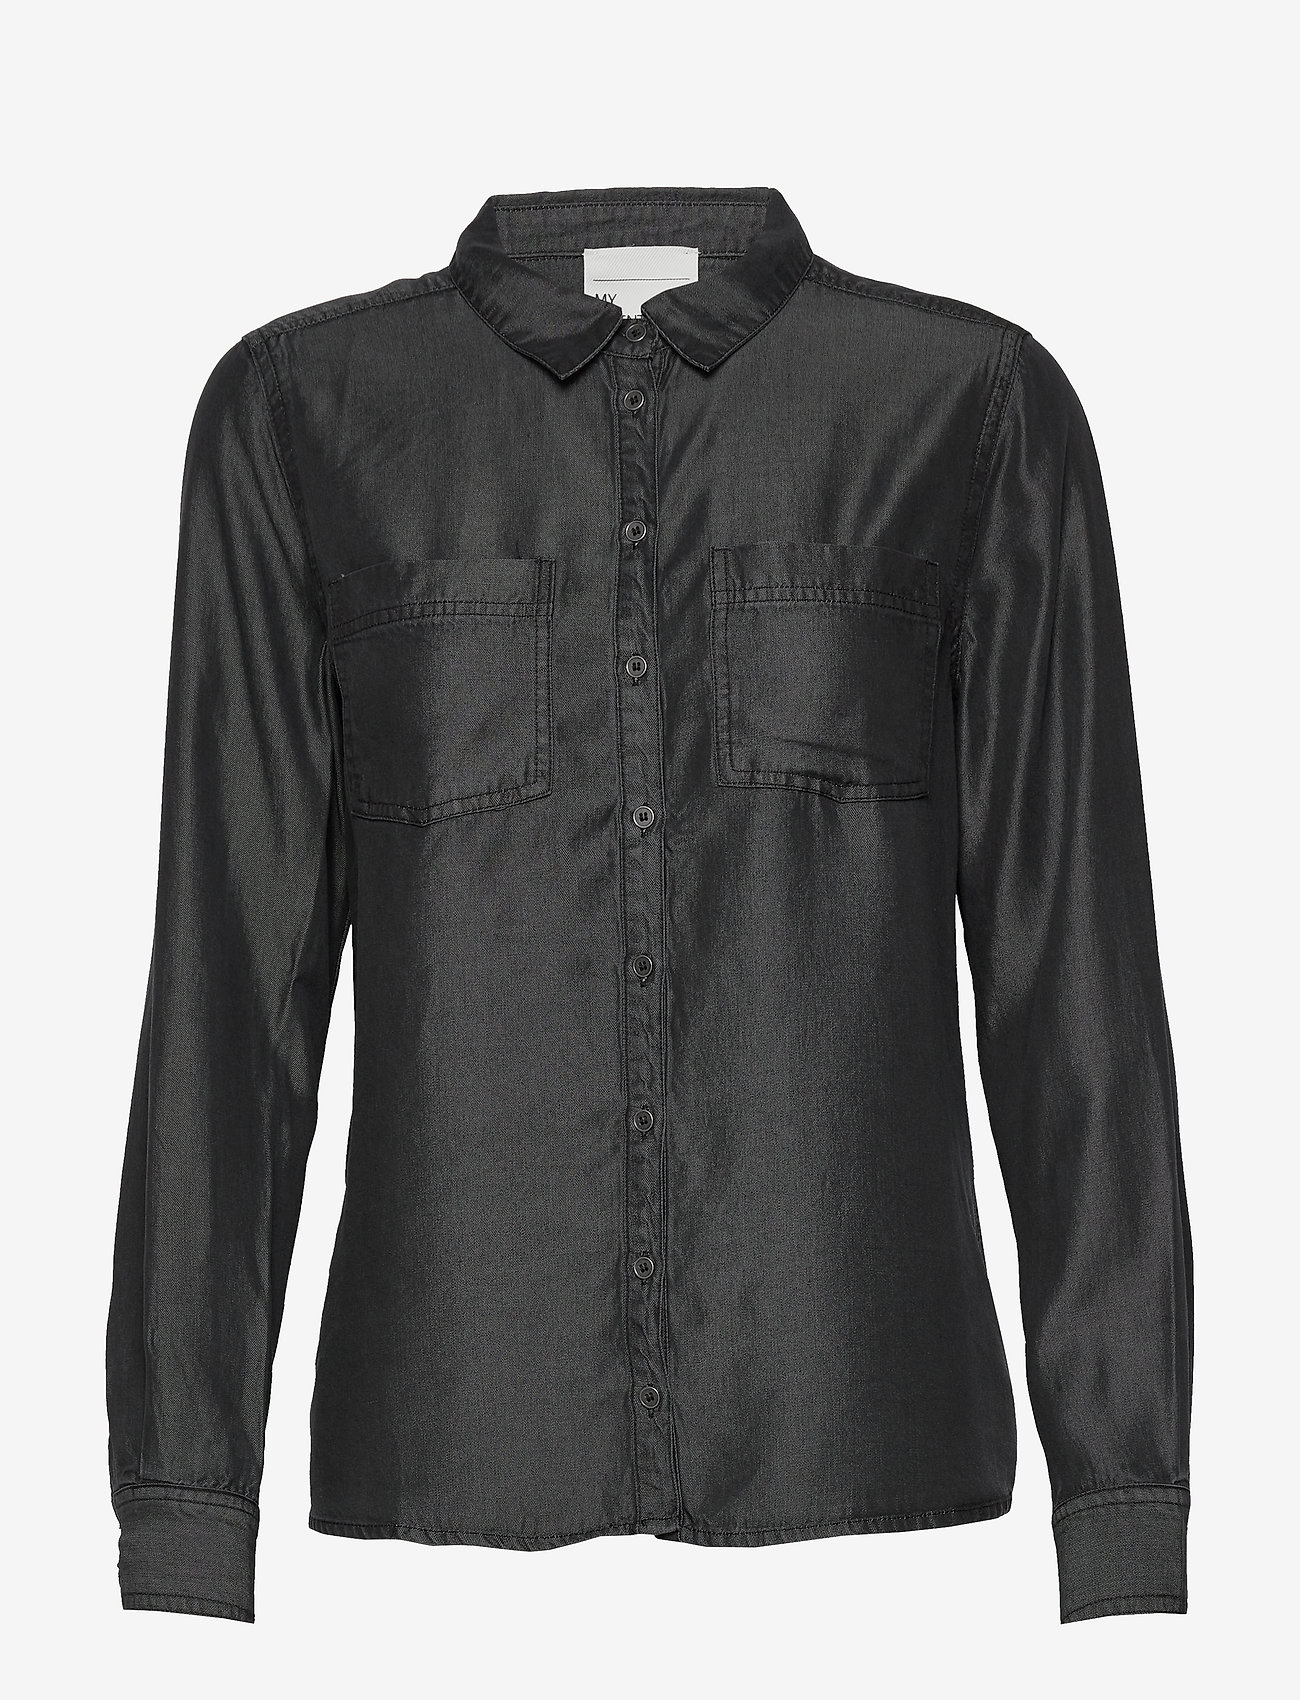 Denim Hunter - 15 THE DENIM SHIRT - jeansskjortor - grey wash - 0